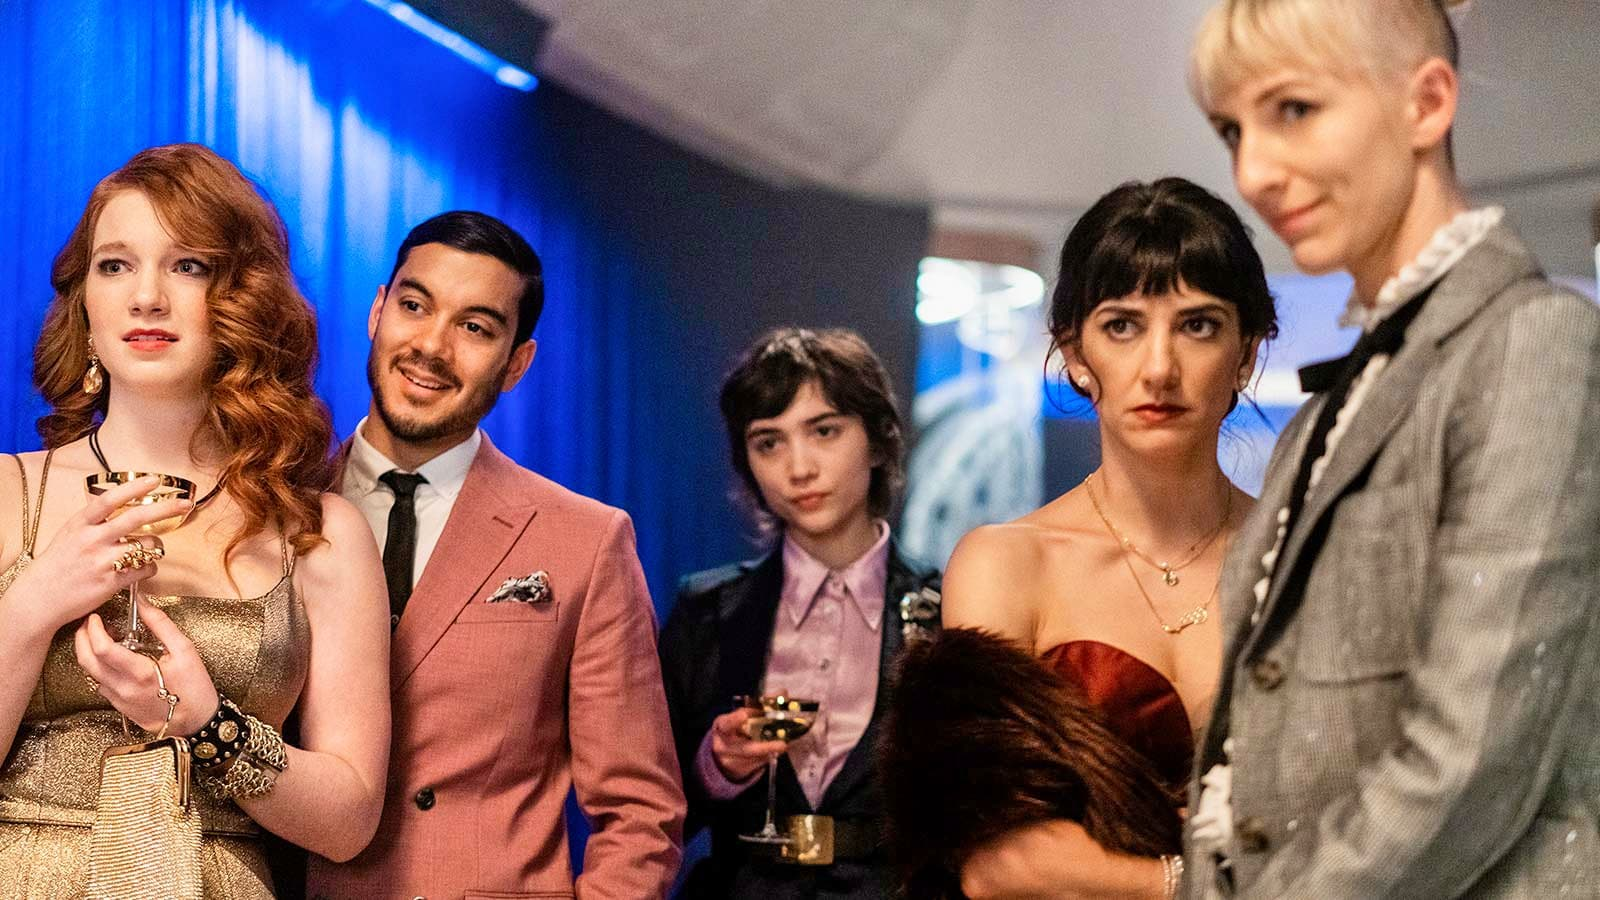 Snowpiercer - Season 2 Episode 9 : The Show Must Go On